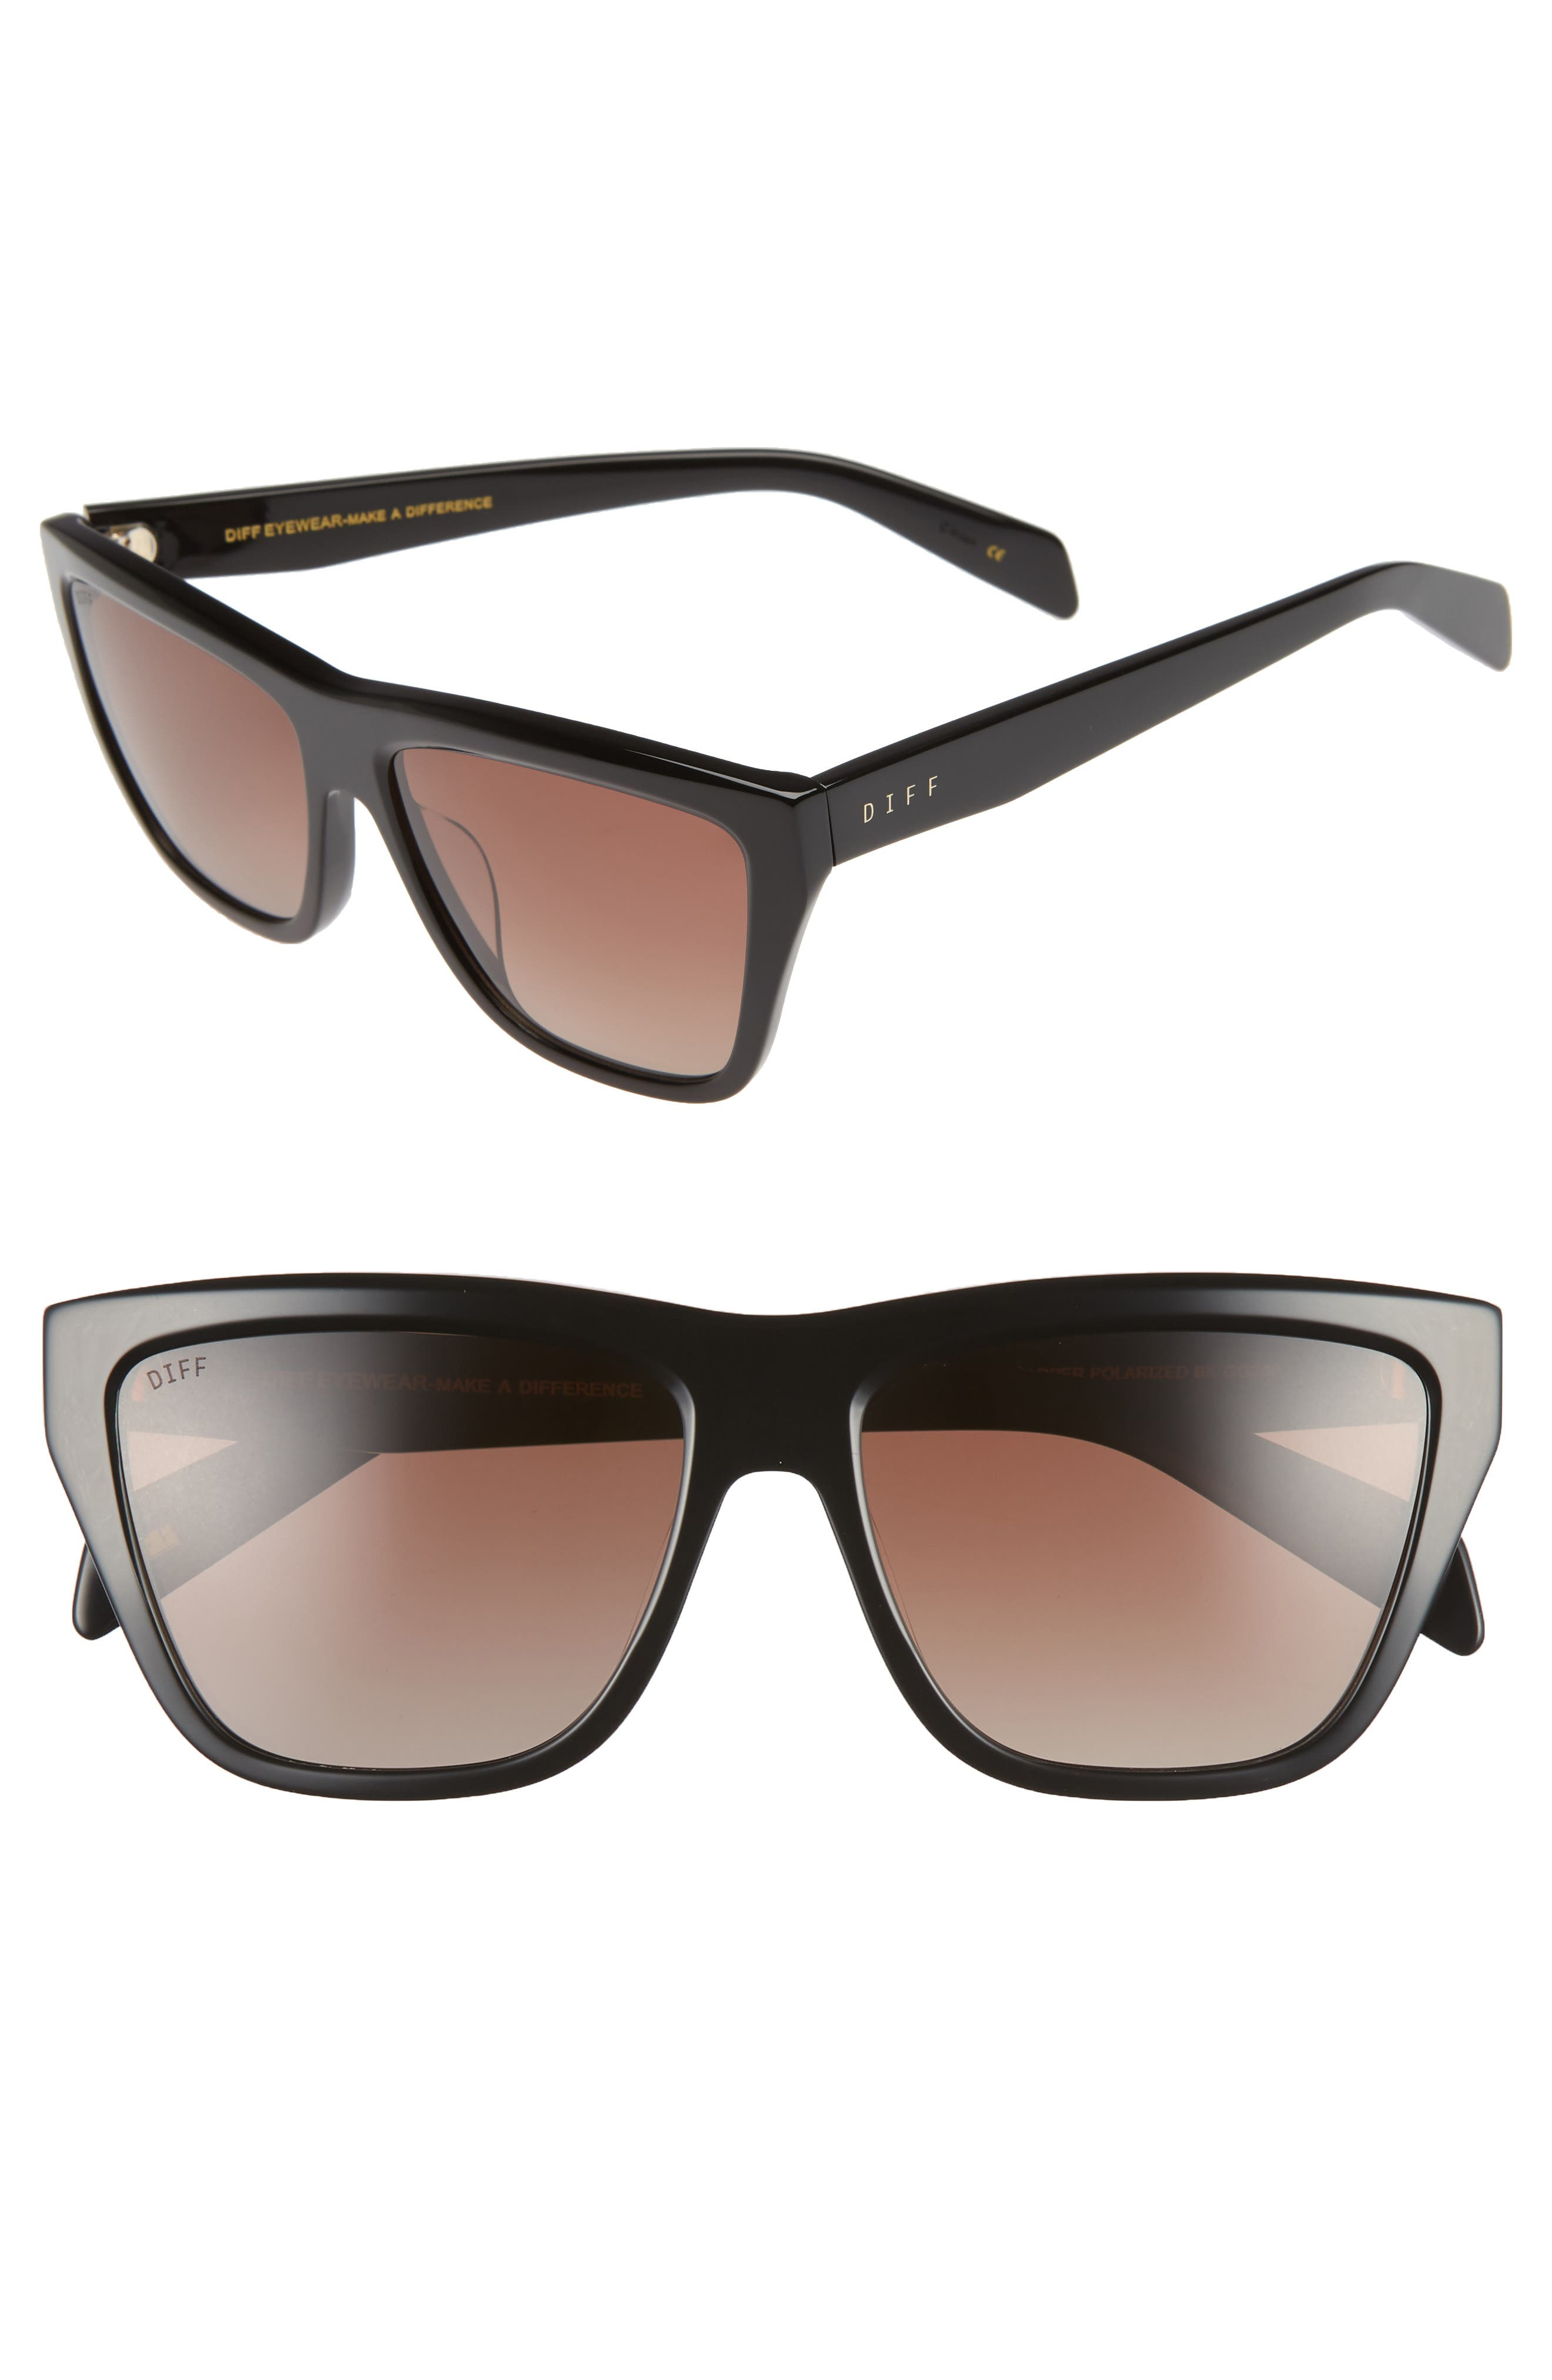 Harper 57mm Polarized Gradient Sunglasses,                             Main thumbnail 1, color,                             BLACK/ BROWN